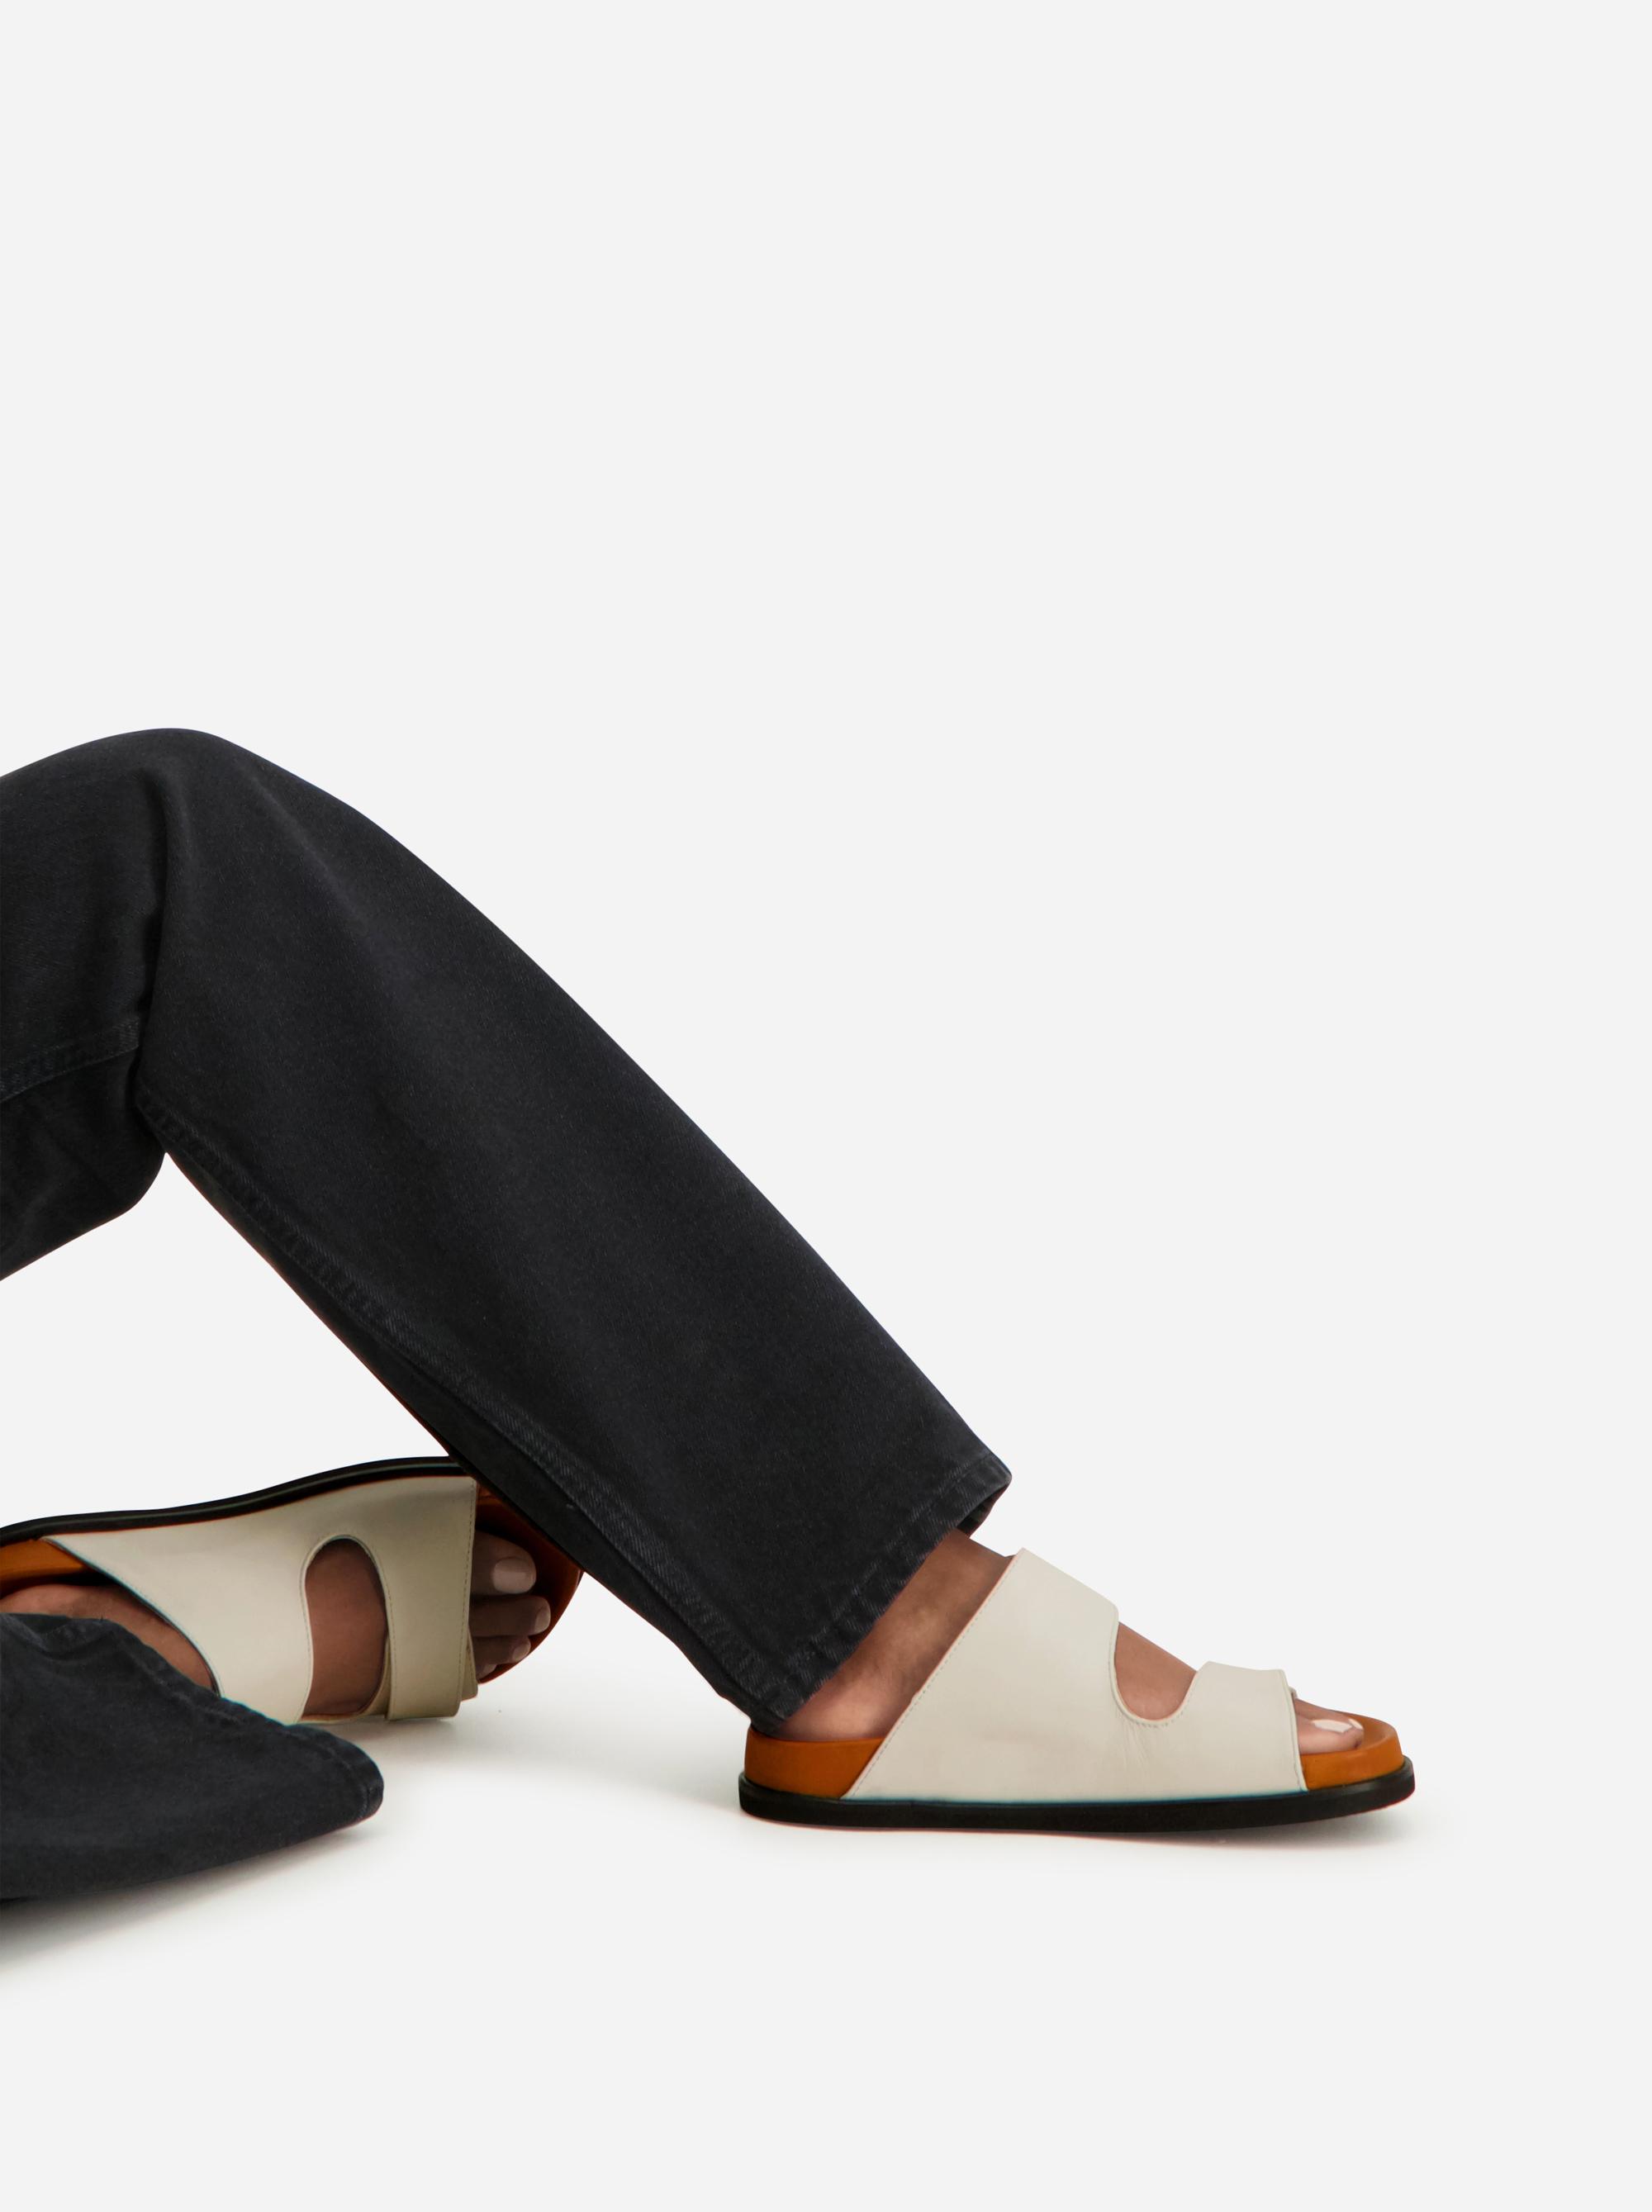 Teym - The Sandal - White - Women - 2